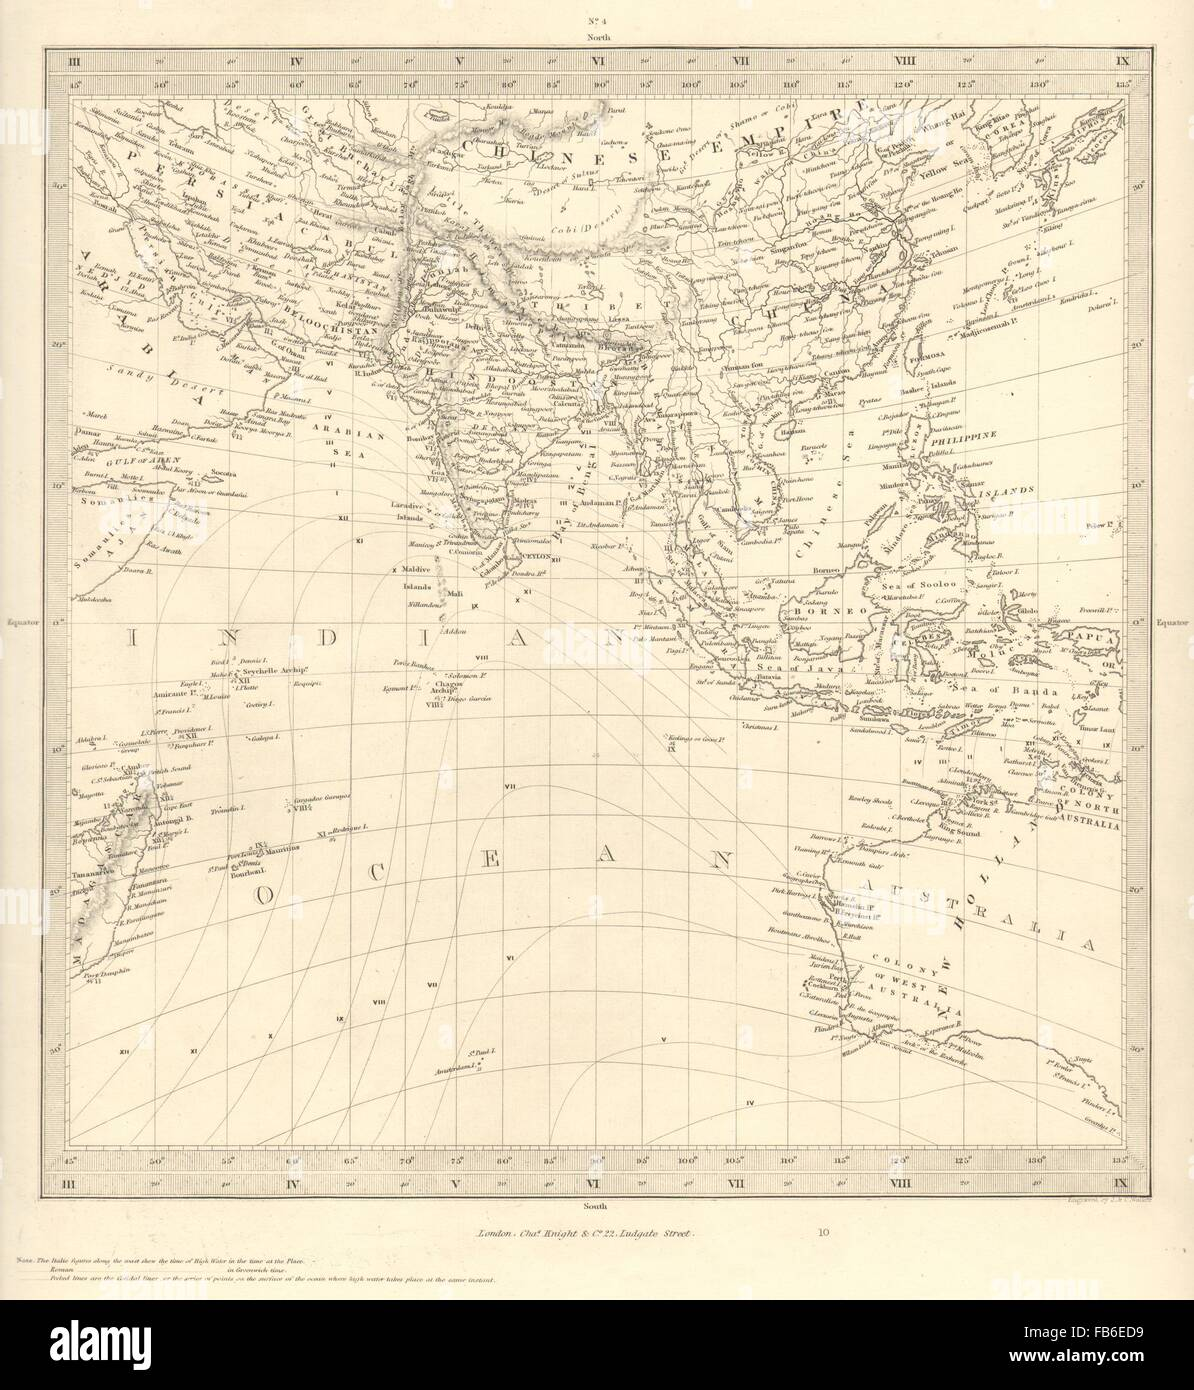 asia australia on gnomonic projection china india persia sduk 1848 old map